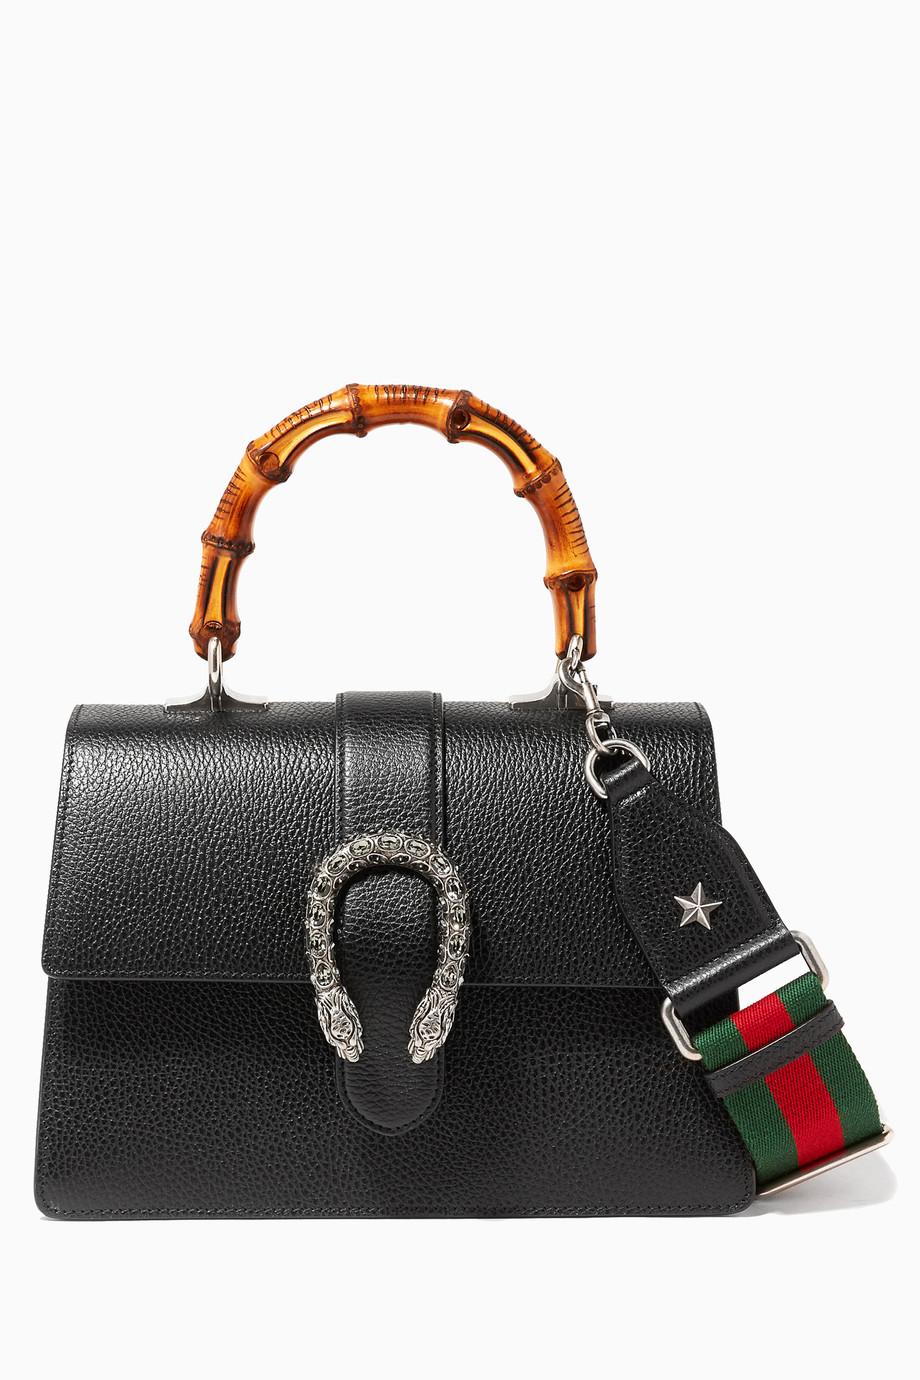 8bd26745f7a Shop Gucci Multicolour Black Dionysus Leather Top Handle Bag for ...